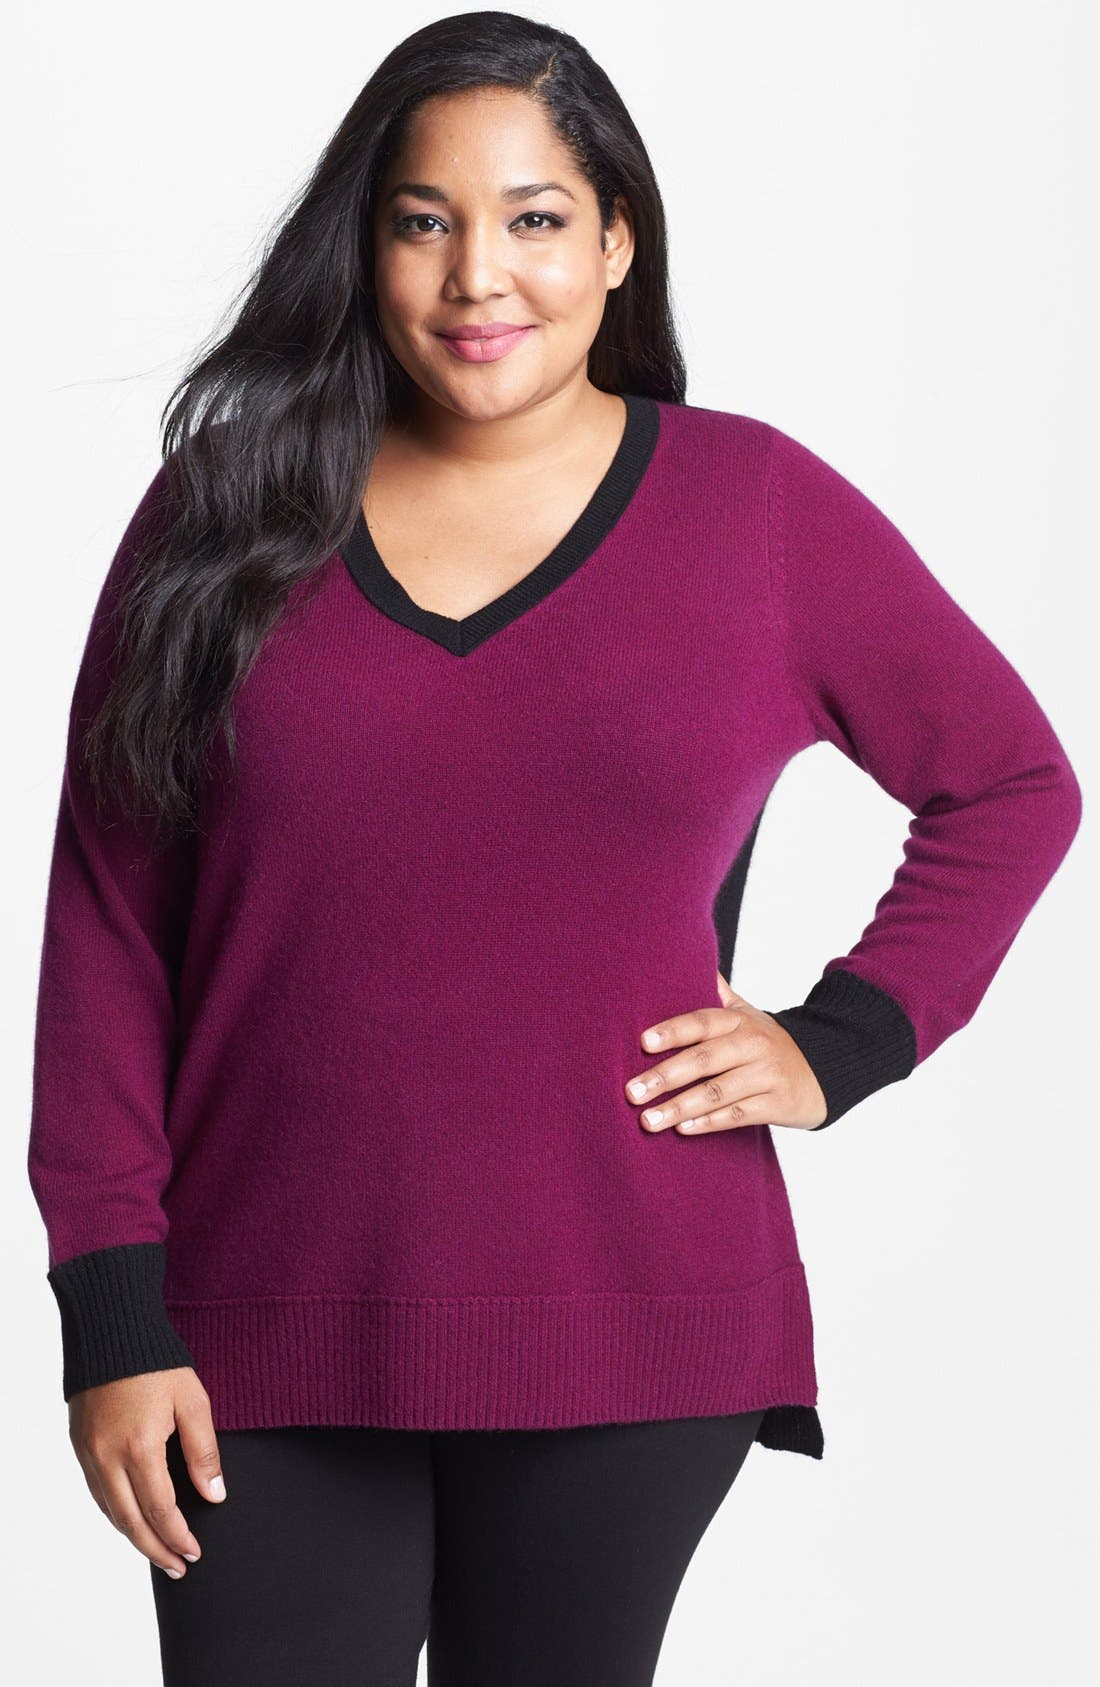 Alternate Image 1 Selected - Halogen® Colorblock Cashmere Sweater (Plus Size)